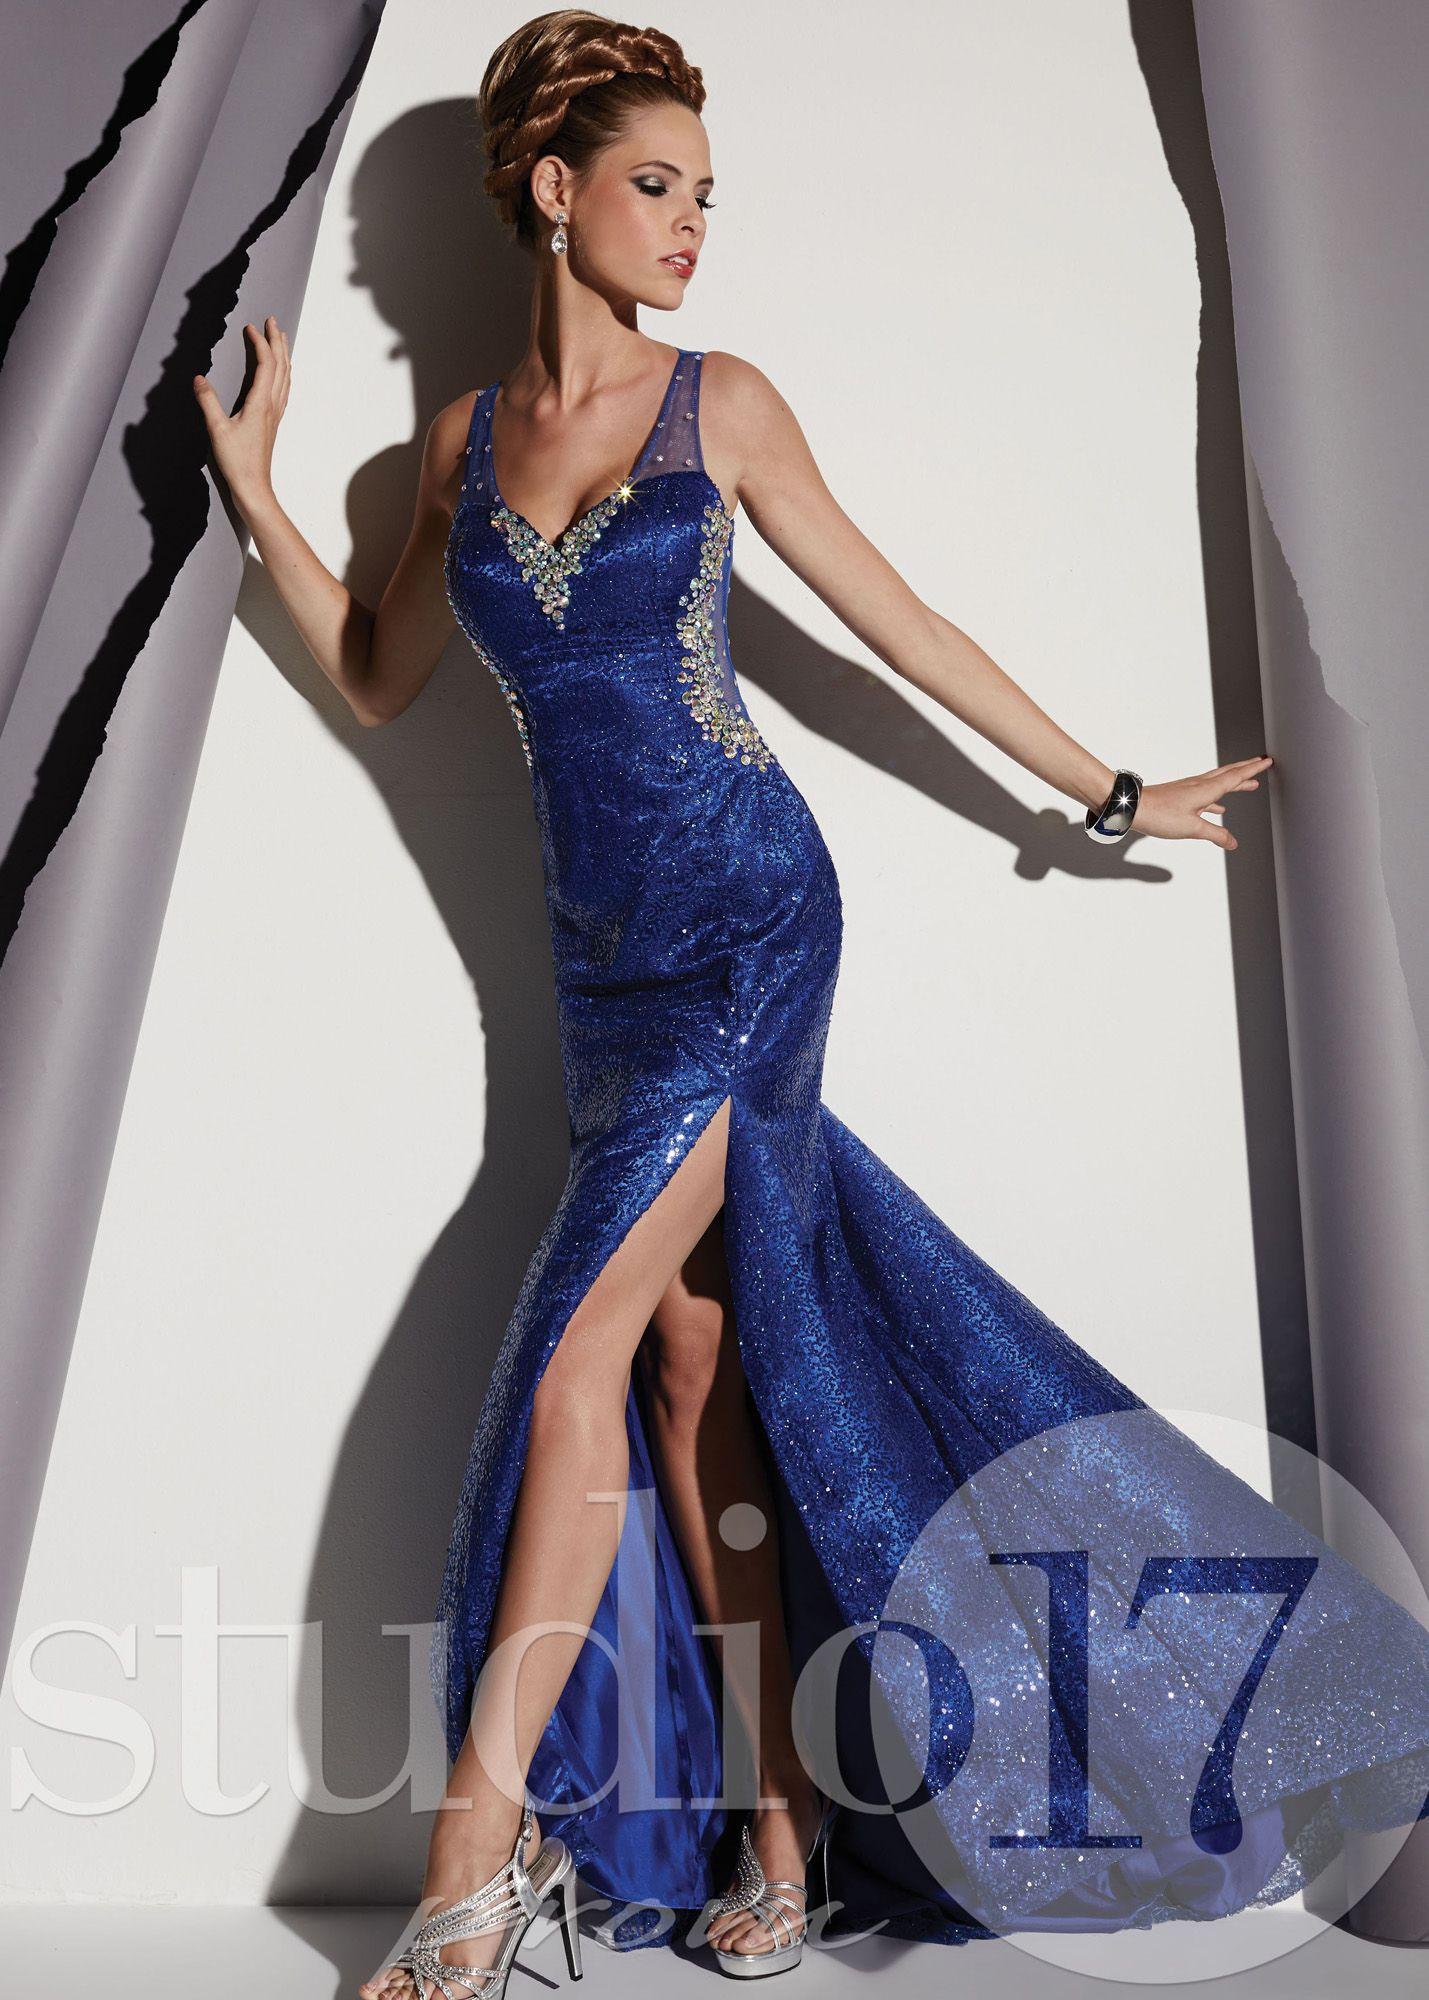 Studio royal sweetheart trumpet prom dresses online